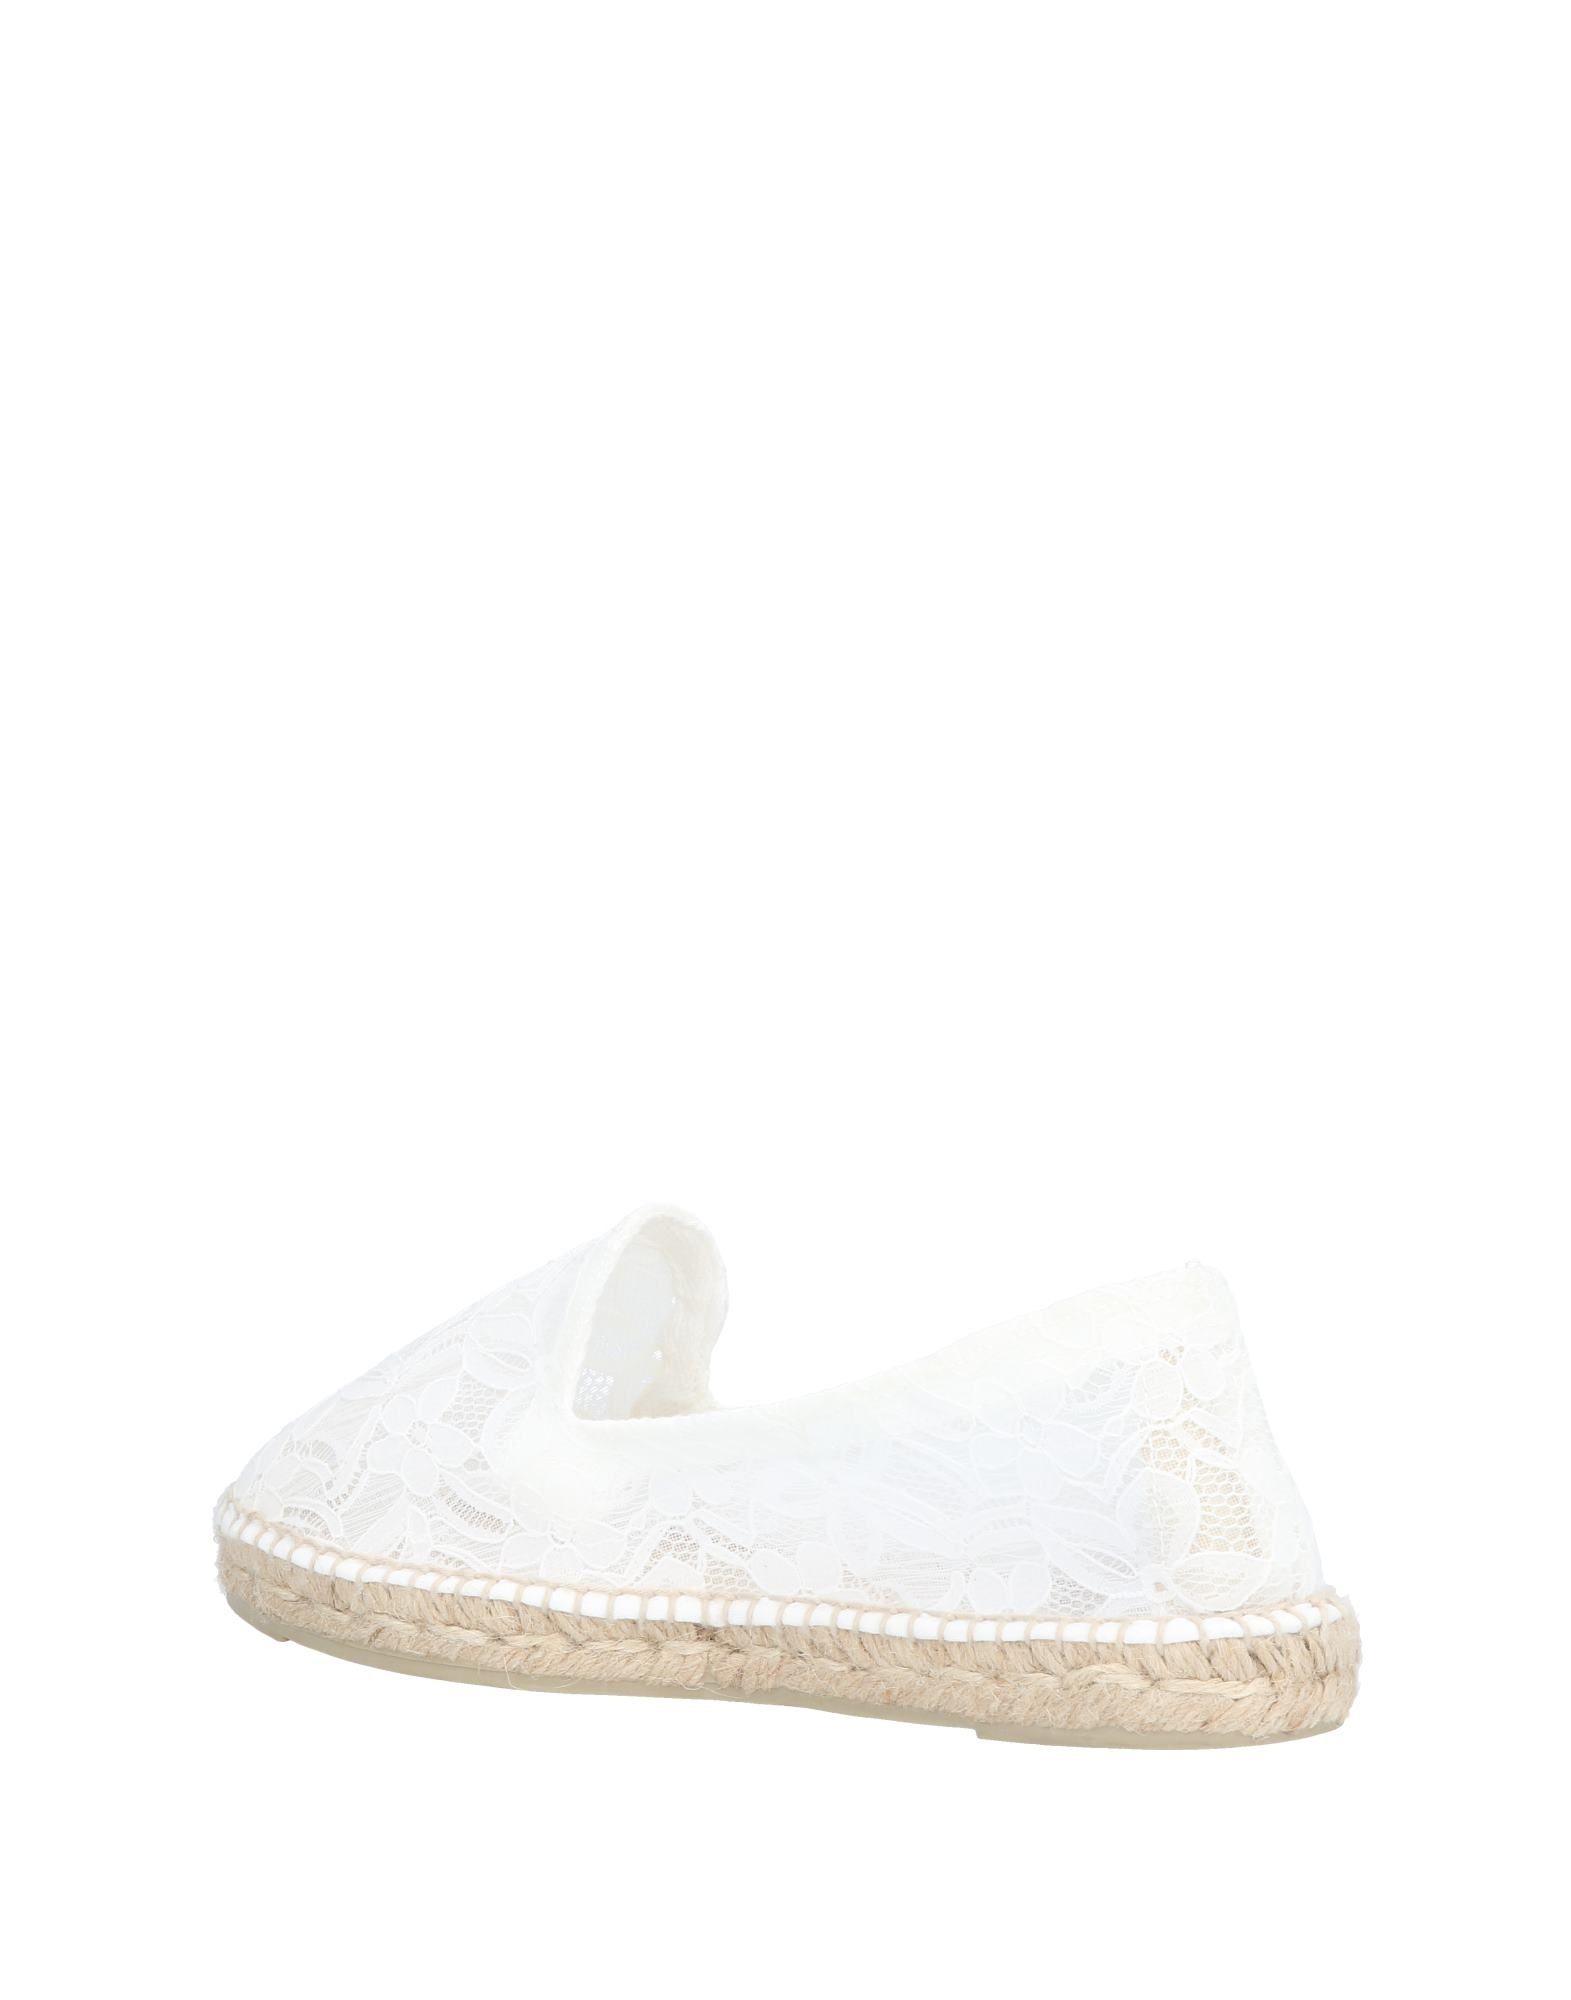 Manebí Manebí Manebí Espadrilles Damen  11272129JW Gute Qualität beliebte Schuhe 1a14d6